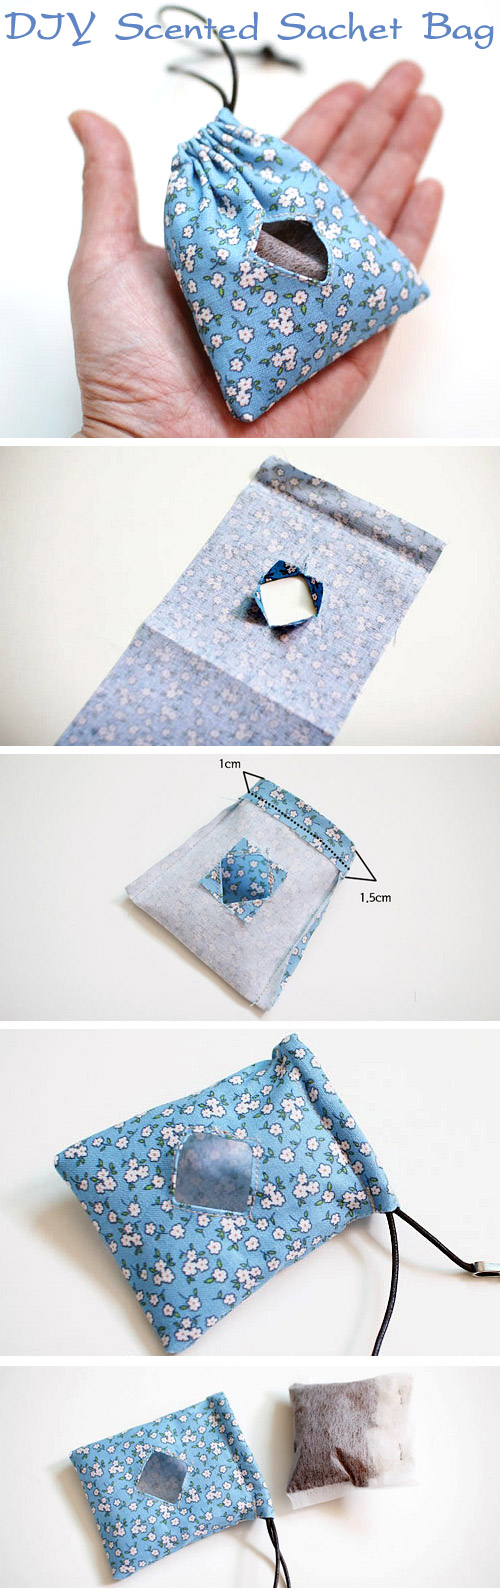 DIY: Scented Sachet Bag Tutorial. Craft Ideas. Step-by-Step Tutorial   http://www.handmadiya.com/2015/11/diy-scented-sachet-bag-tutorial.html